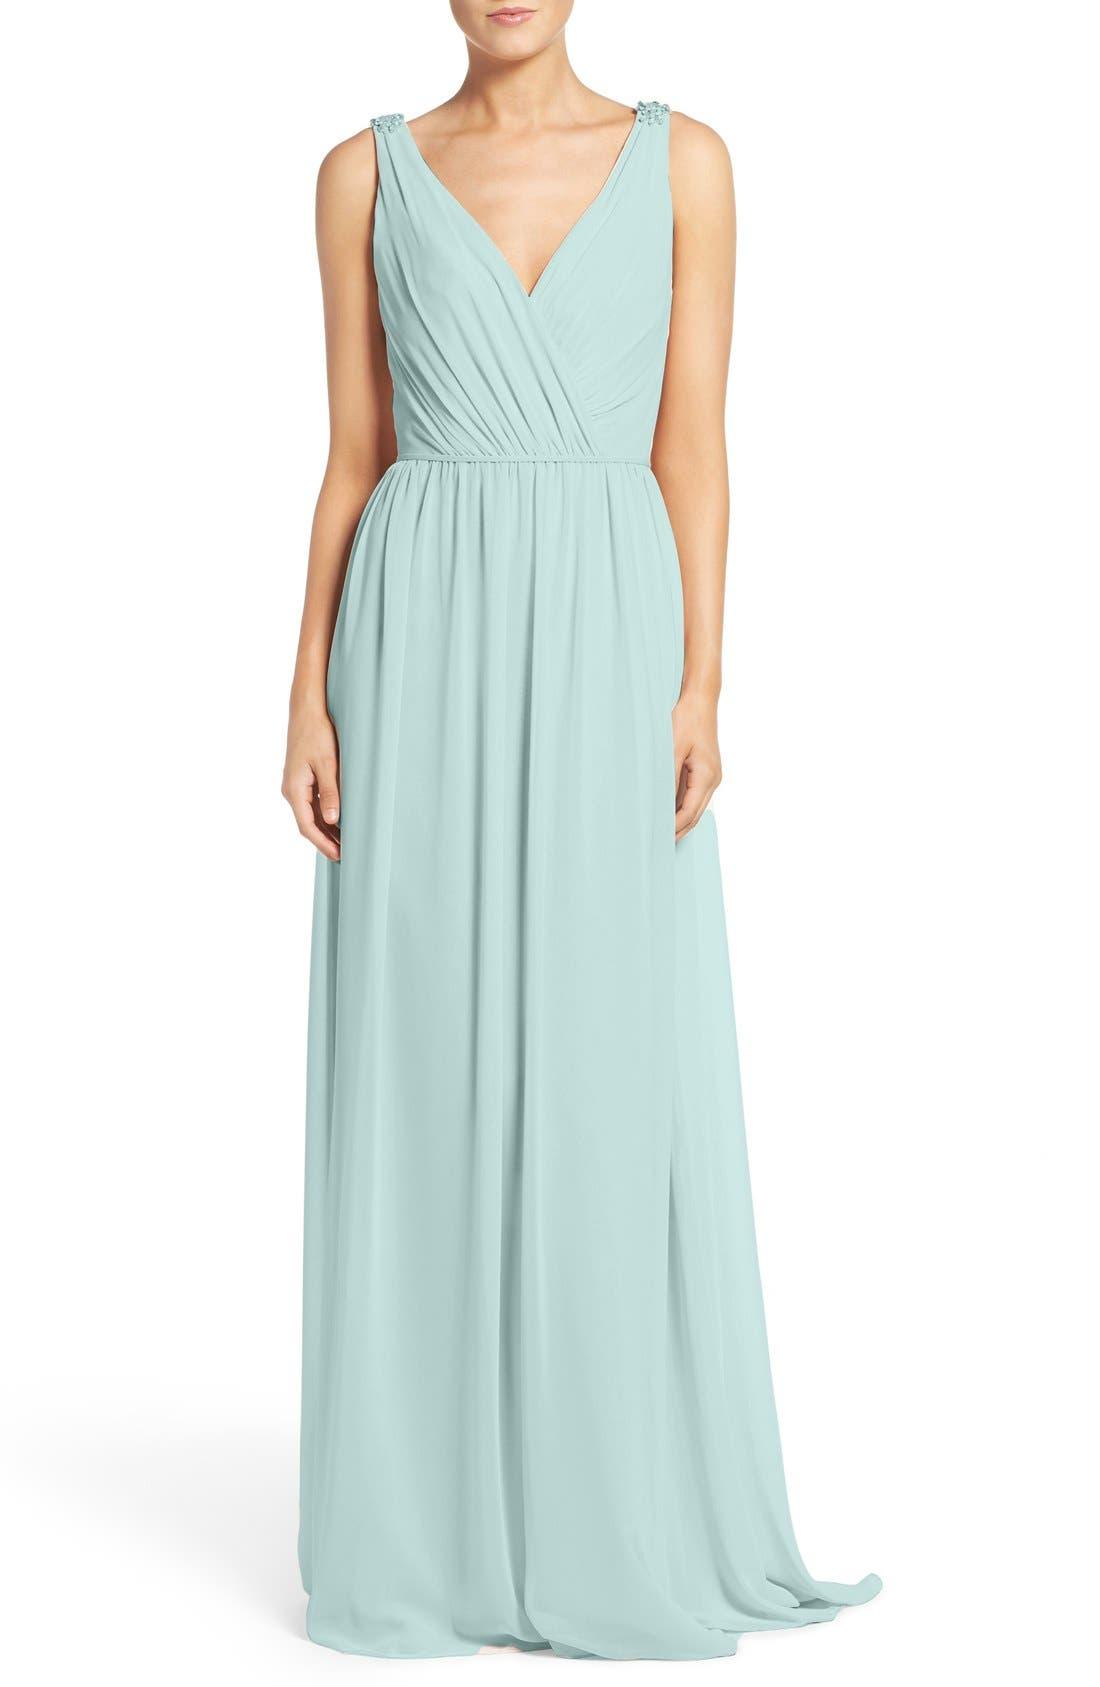 Alternate Image 1 Selected - Hayley Paige Occasions Embellished Shoulder V-Neck Chiffon Gown